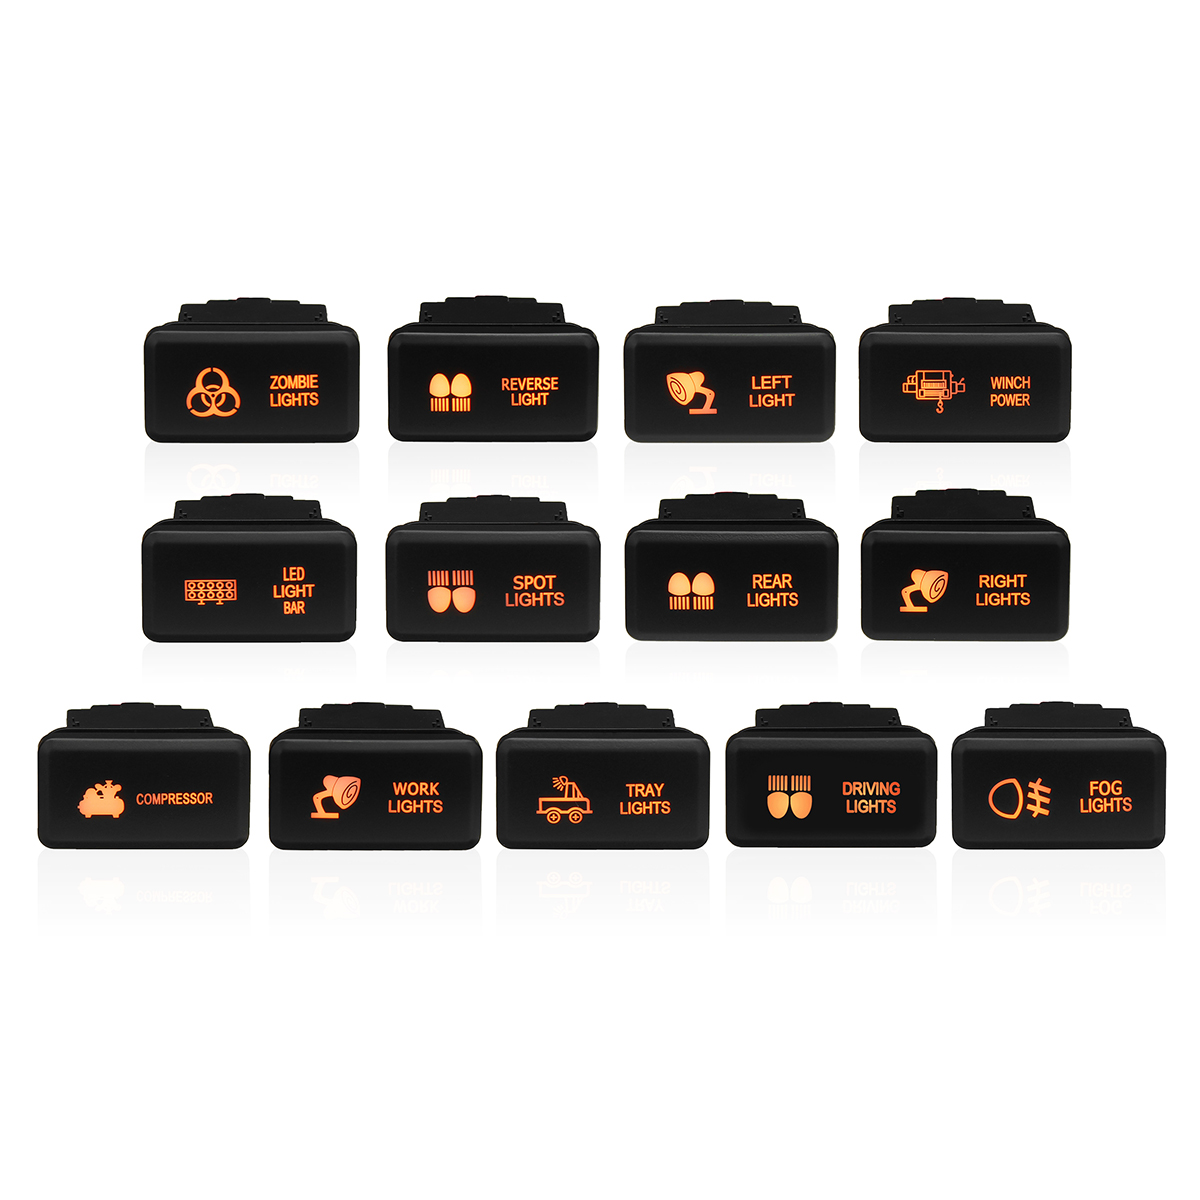 BANDC Car Custom 3 Amp 12V Orange LED Compressor Push Button Switch with Wire